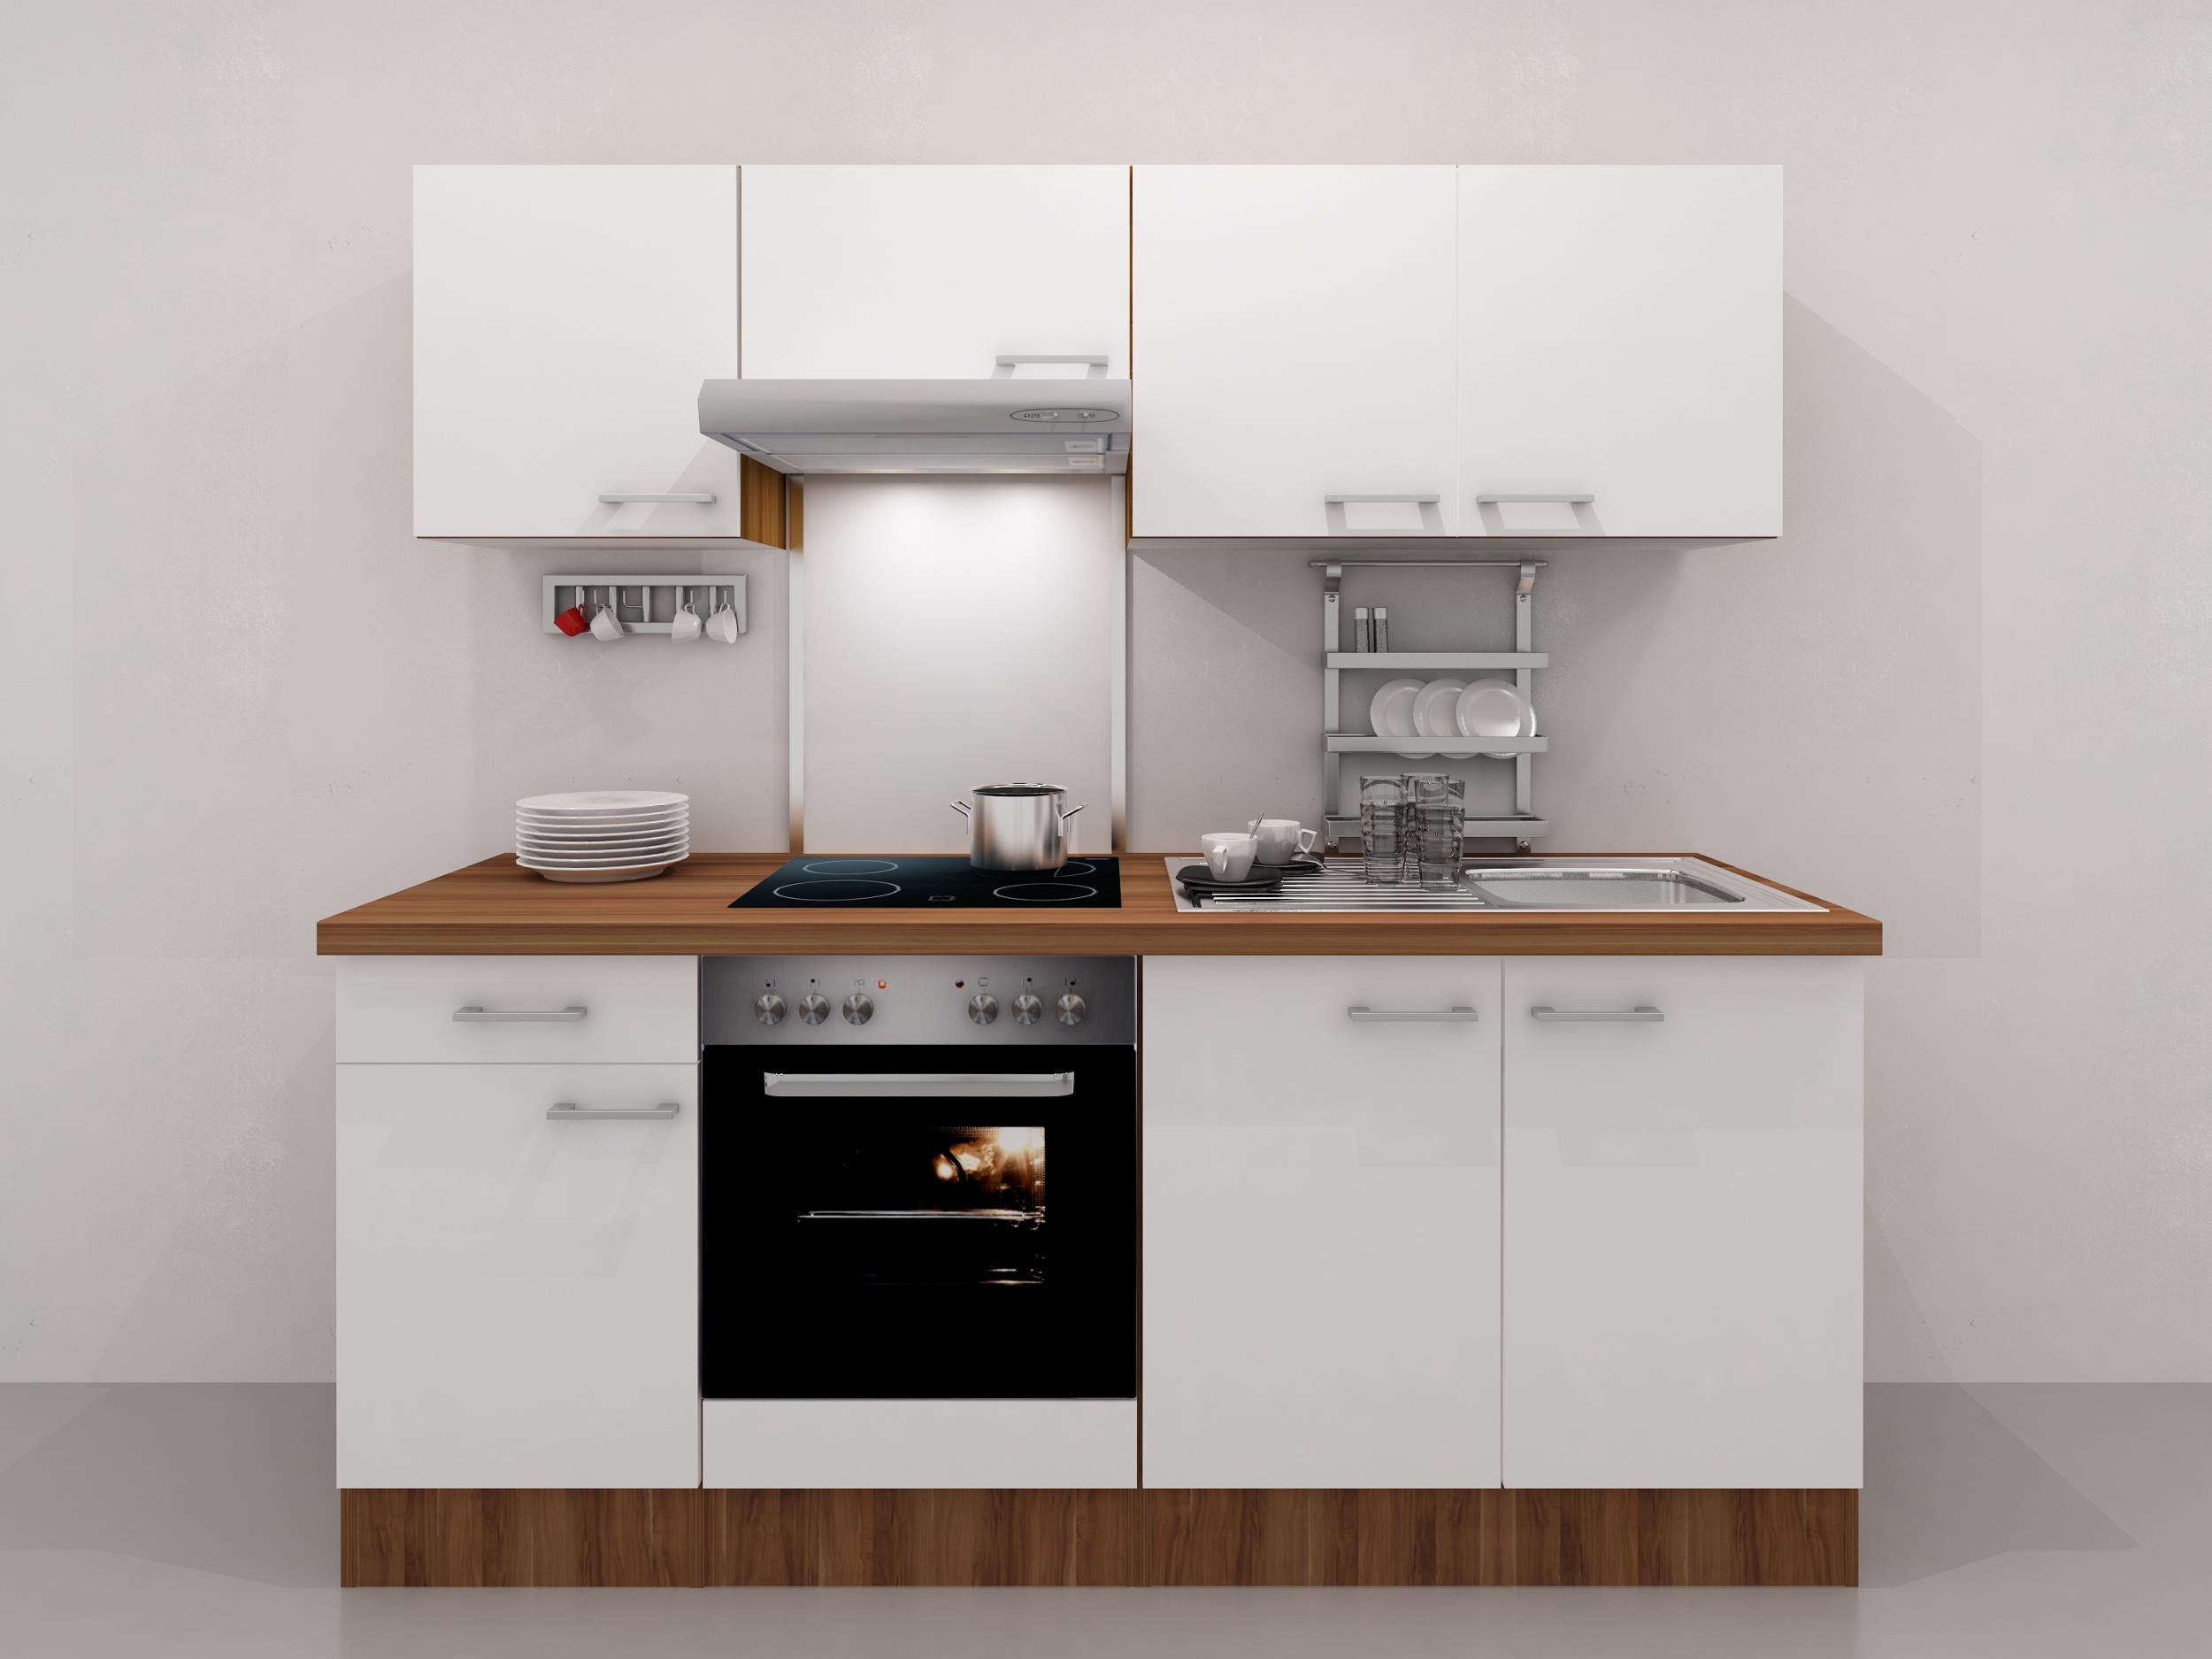 k chen sp lenschrank cosmo 2 t rig 100 cm breit. Black Bedroom Furniture Sets. Home Design Ideas